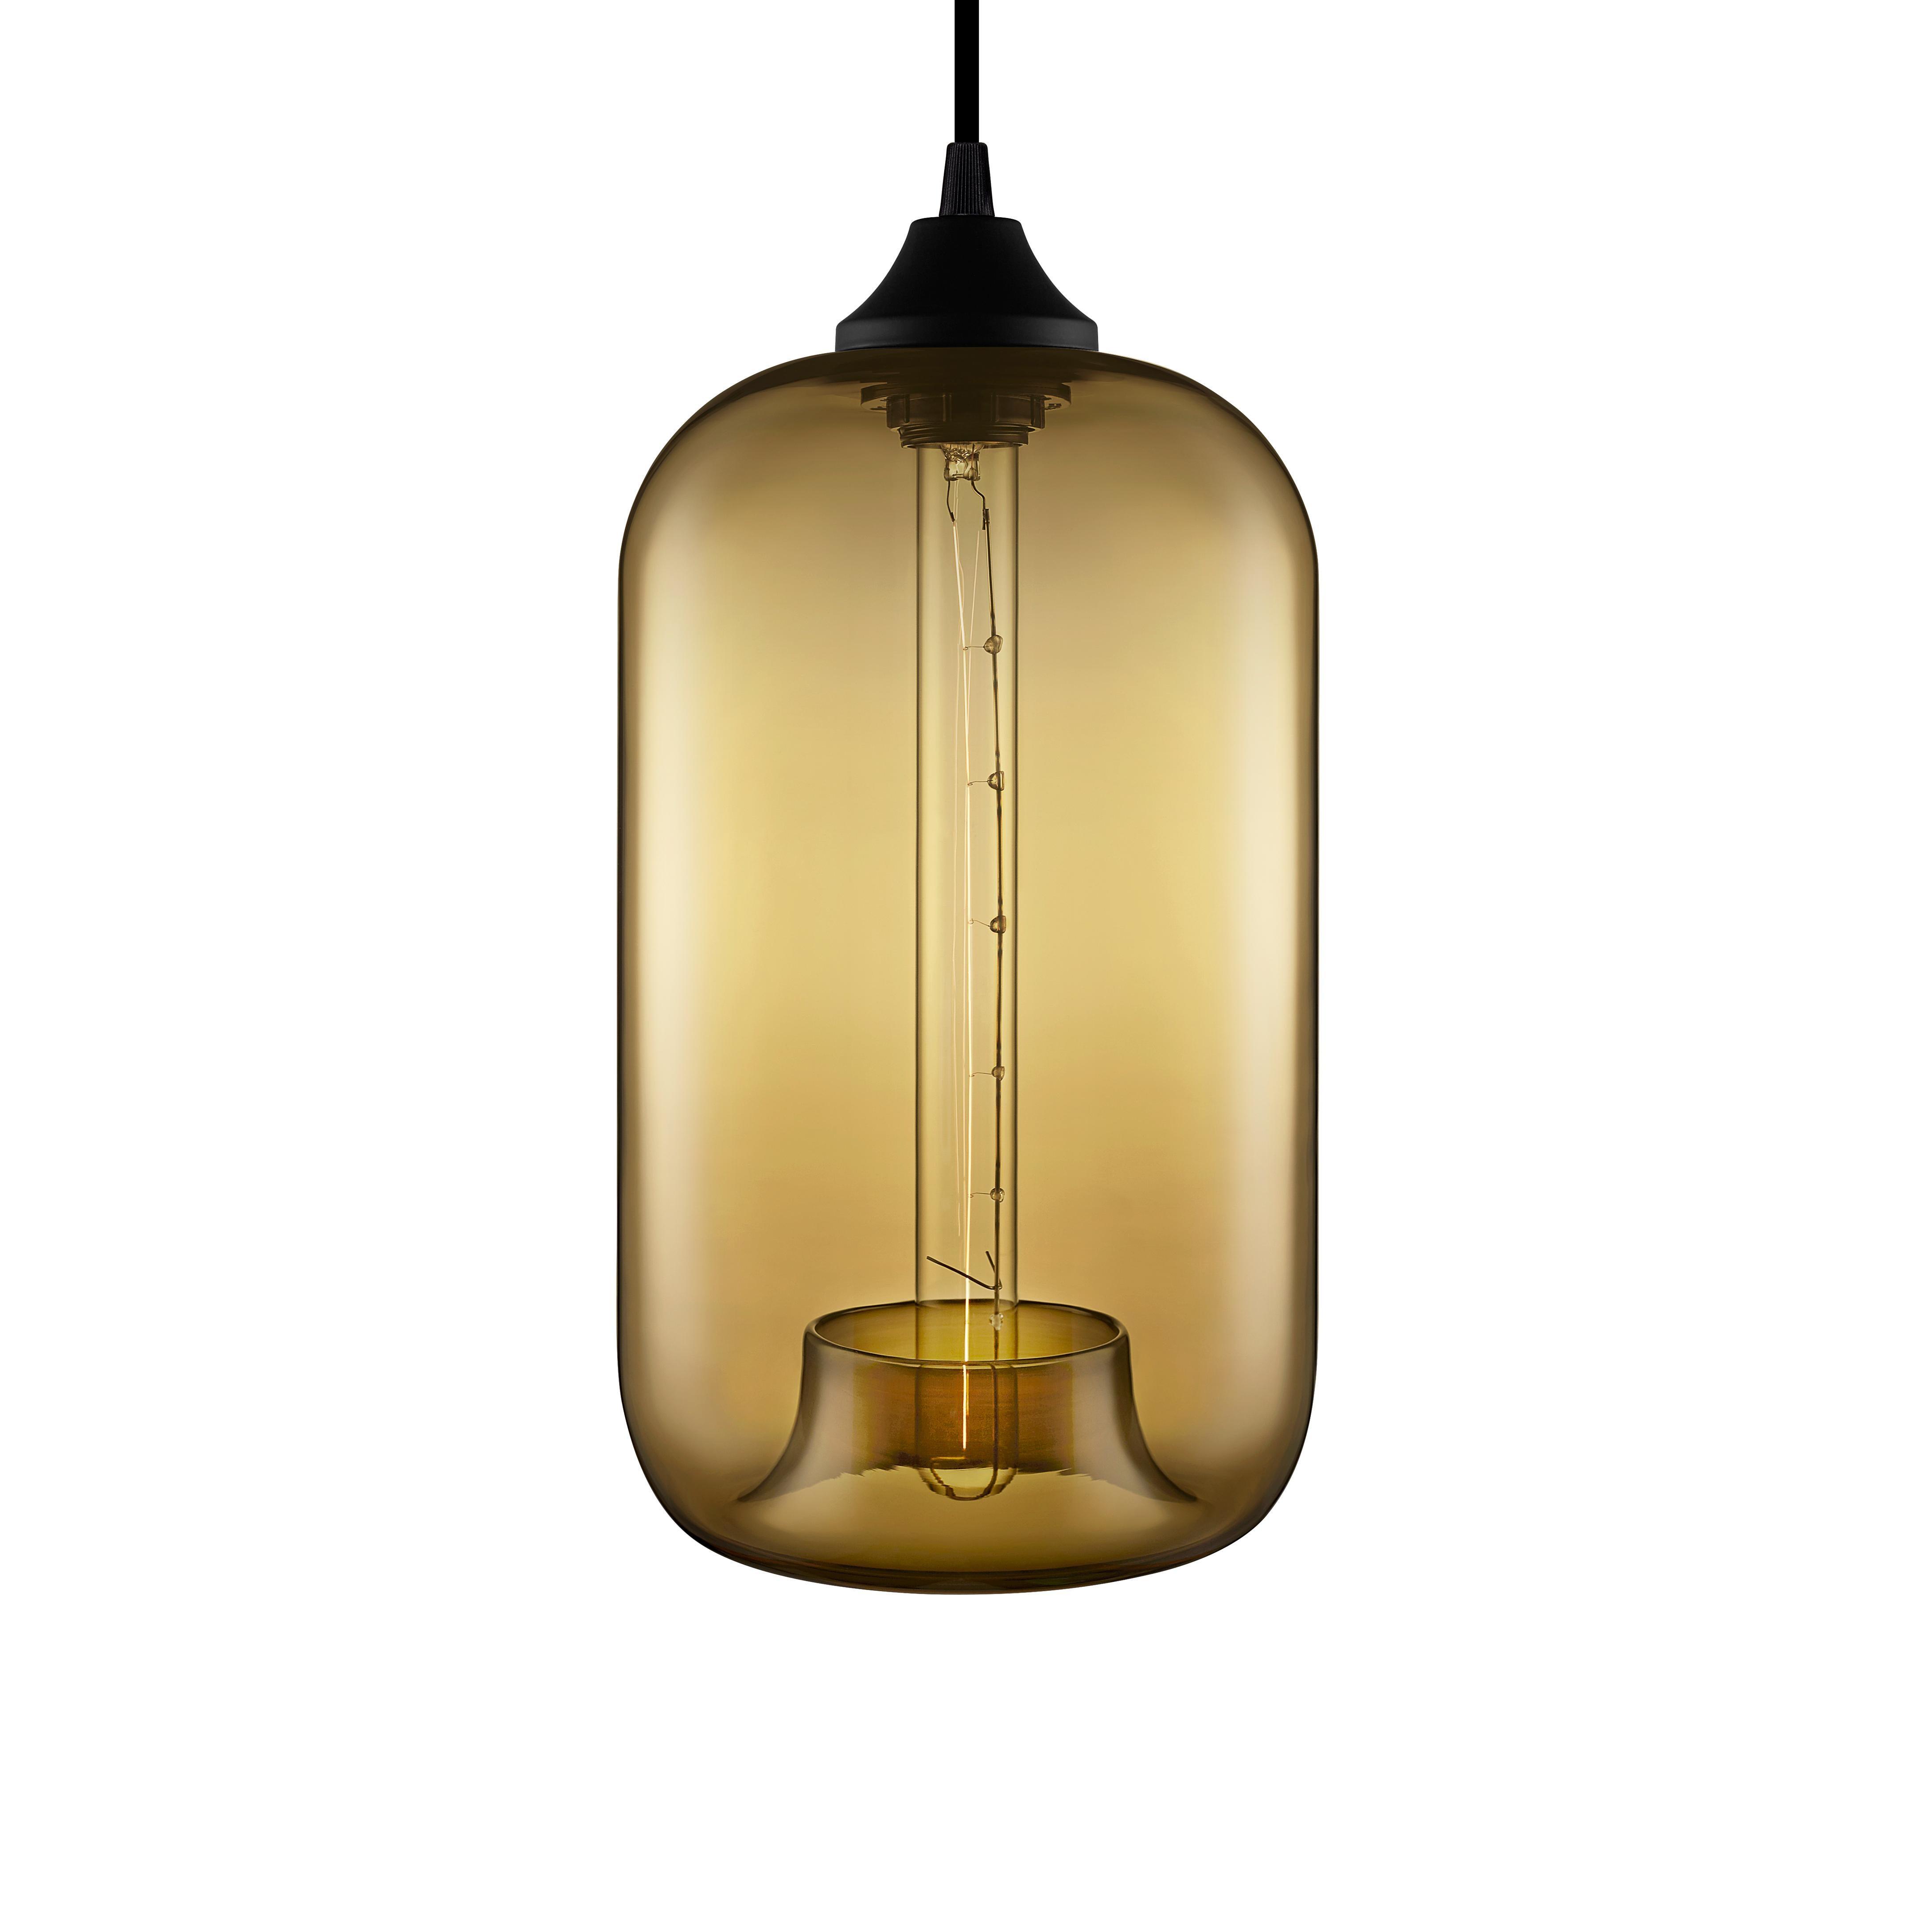 Pod Smoke Handblown Modern Glass Pendant Light, Made in the USA